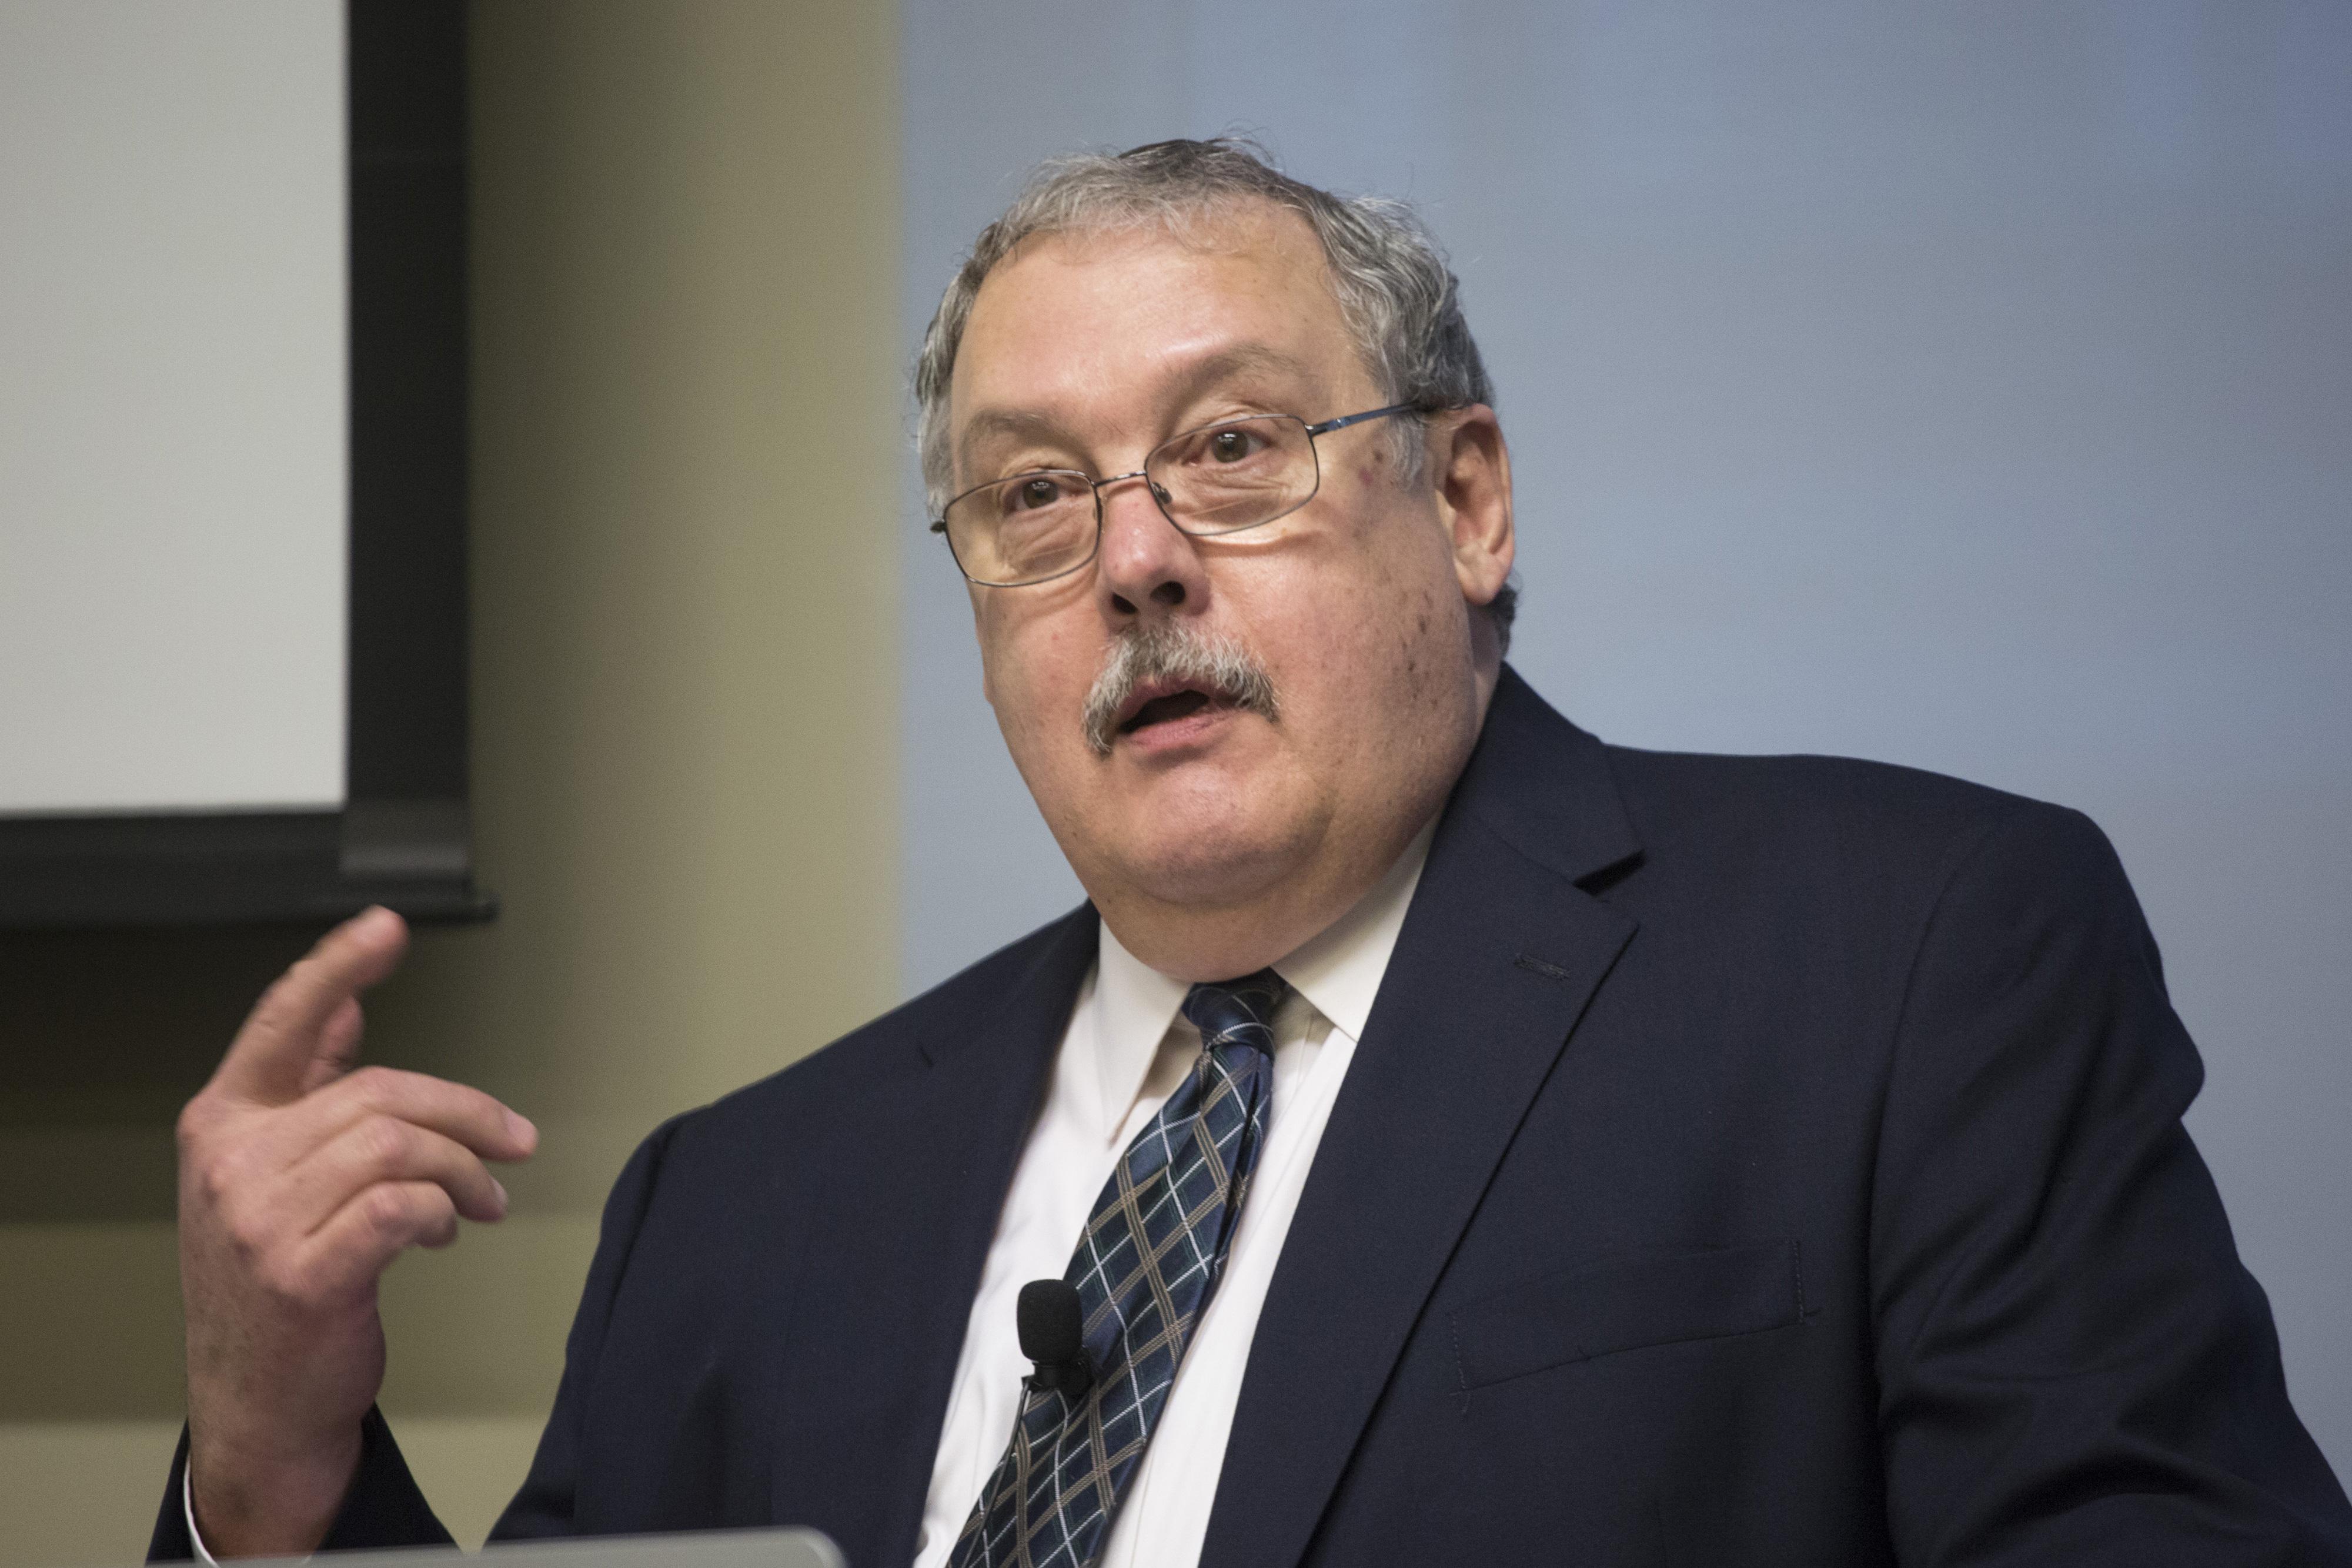 Professor Rex Matthews teaches Methodist history at Candler School of Theology.